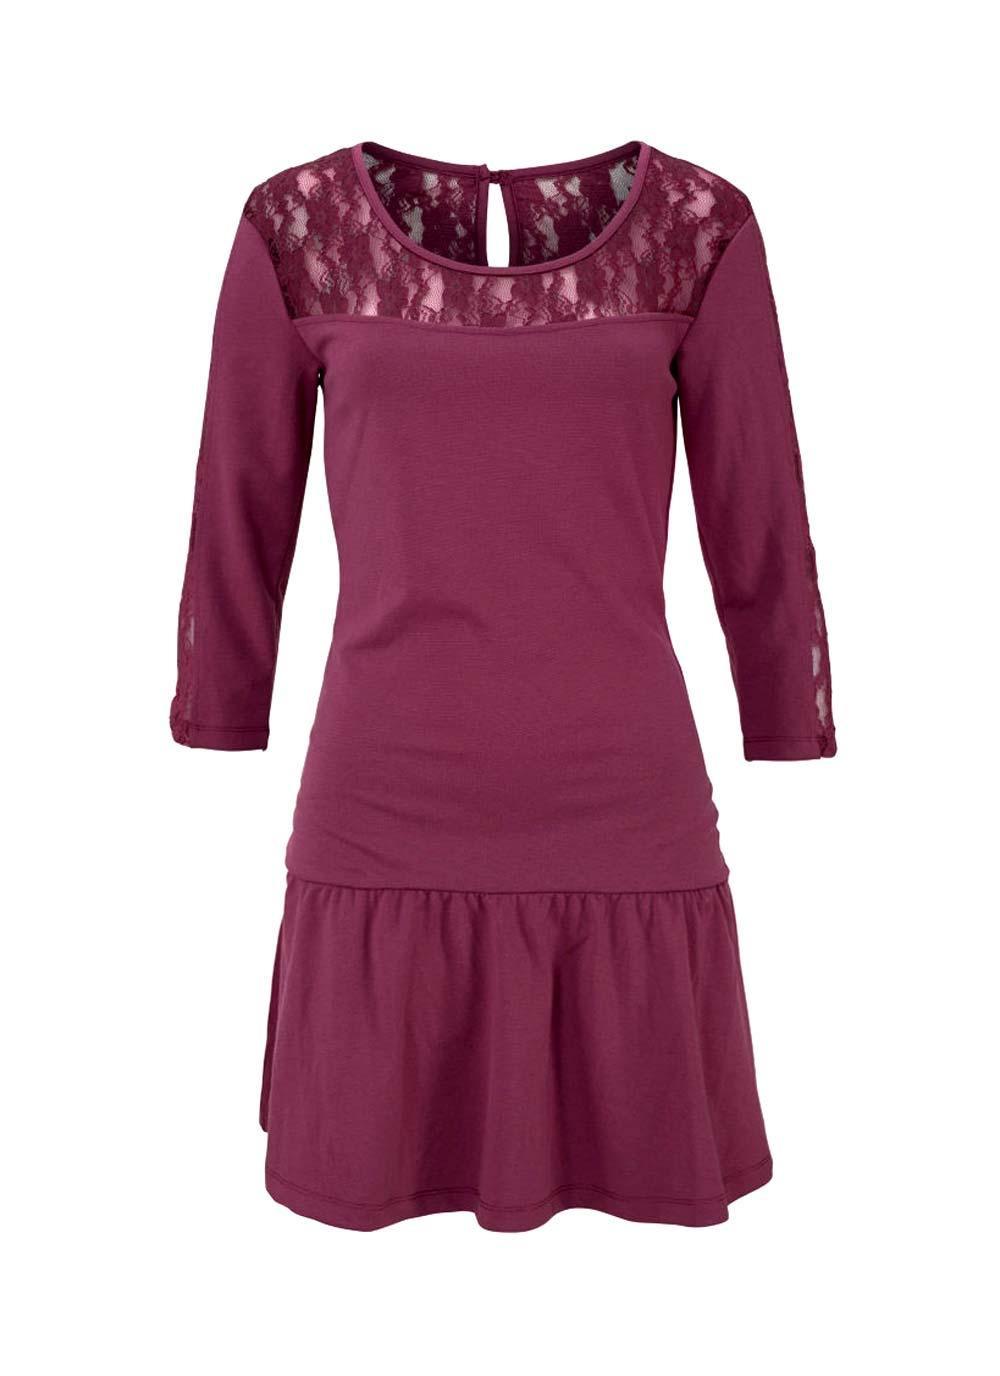 17 Einzigartig Kleid Spitze Bordeaux Ärmel10 Ausgezeichnet Kleid Spitze Bordeaux Bester Preis